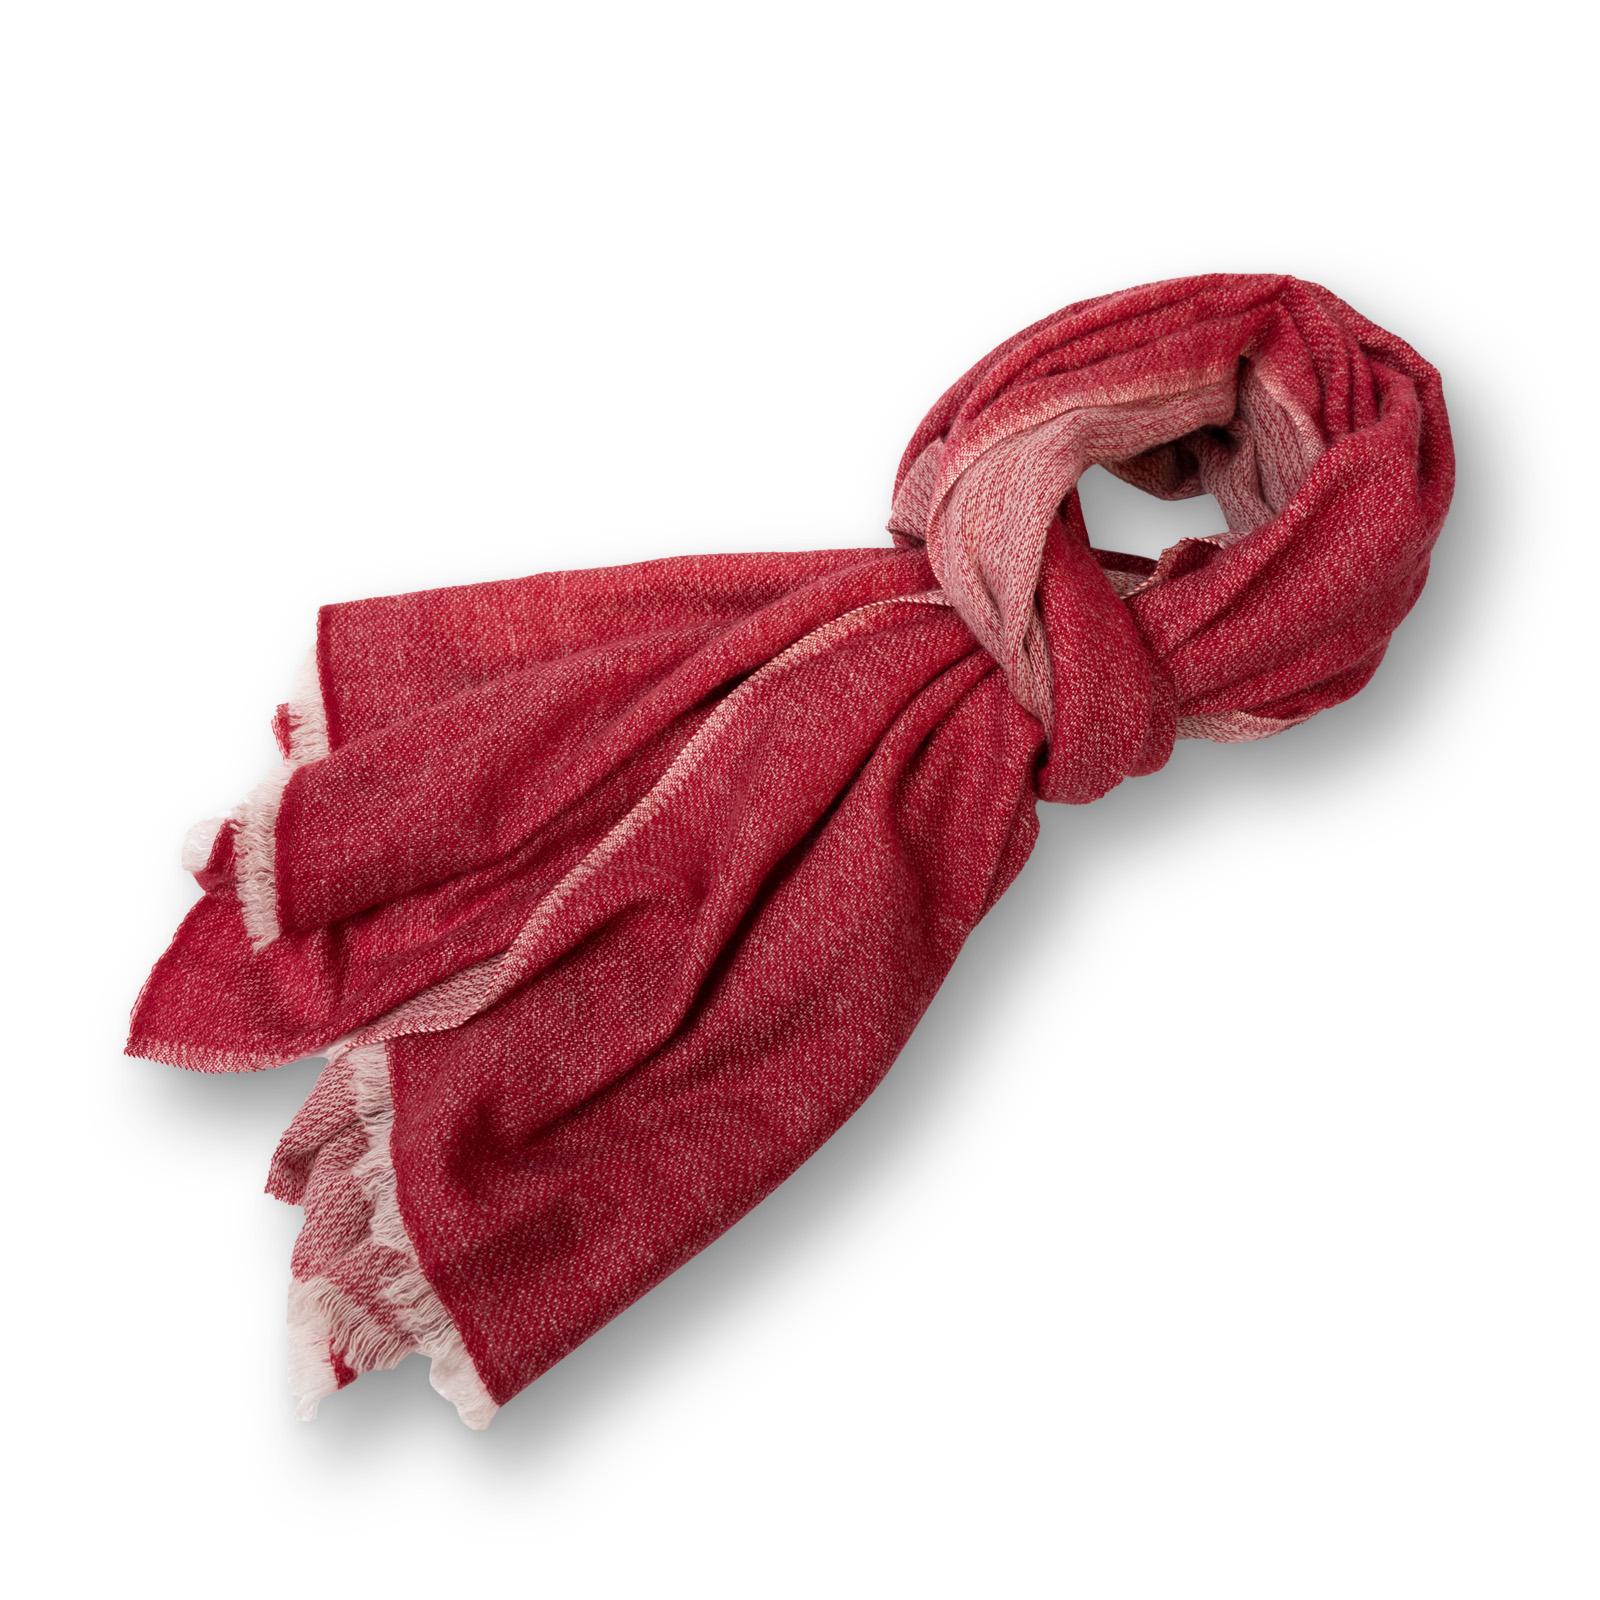 Pashmina - 100% Cashmere  zweifarbig  aus Nepal  70x200 cm  rot/rot-natur